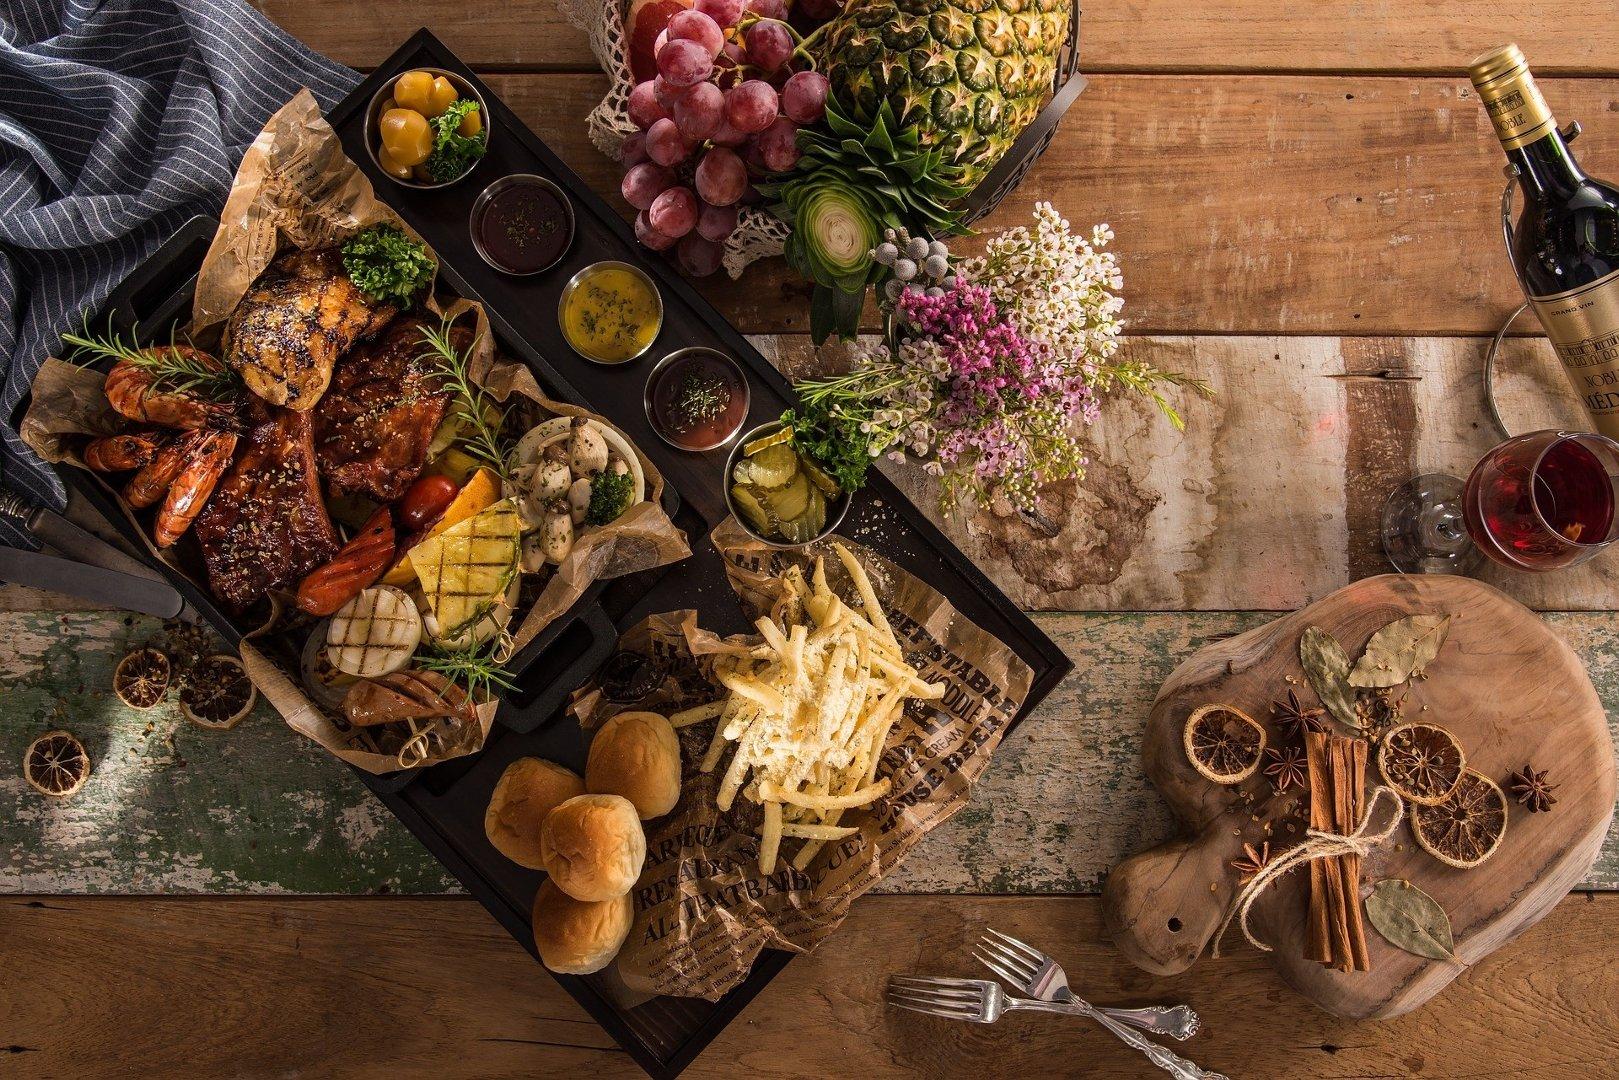 Dieta Montignaca Skuteczna Niskoglikemiczna Dieta Odchudzajaca